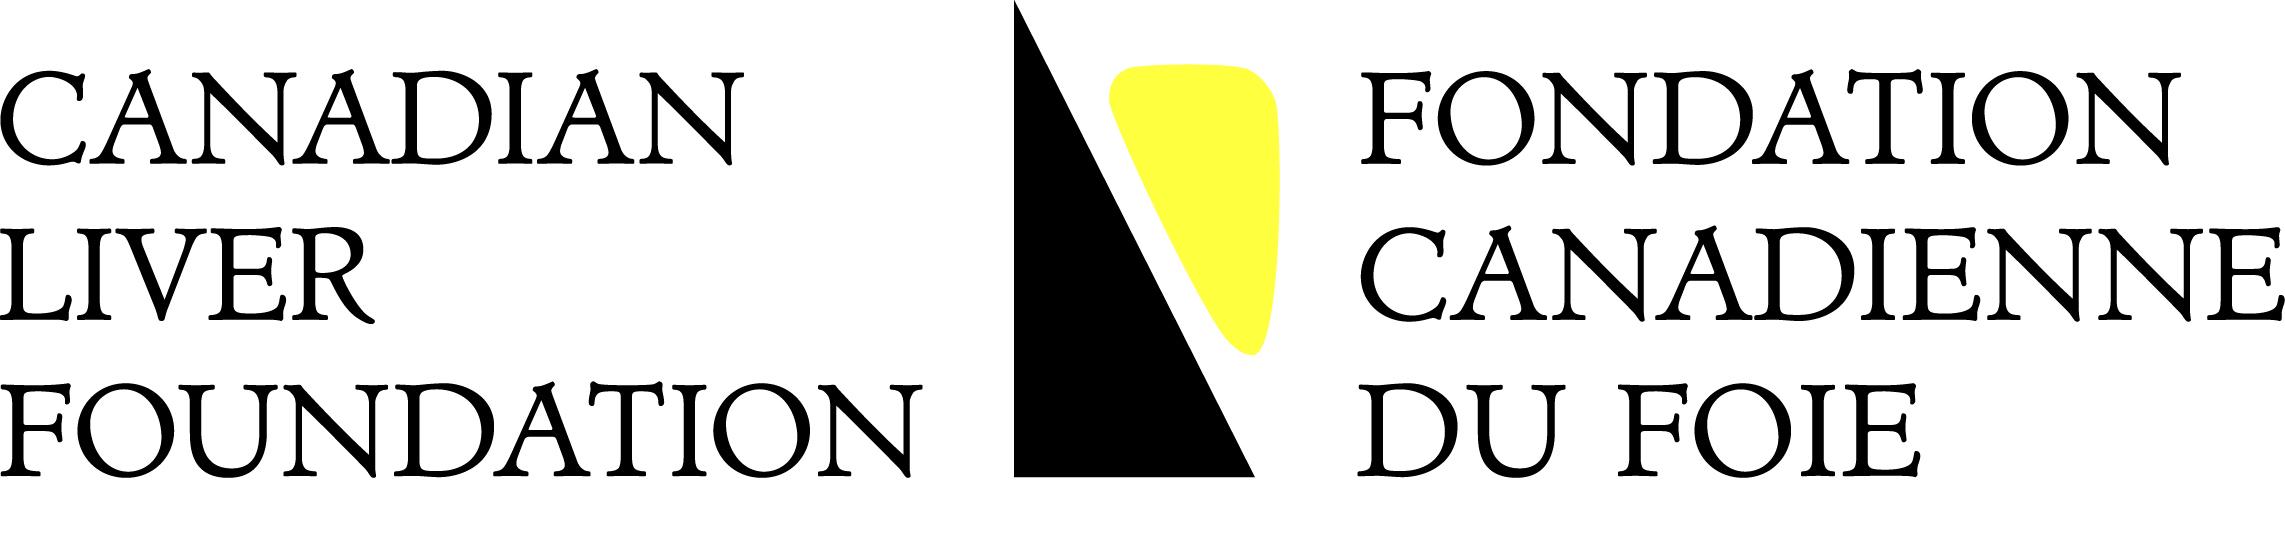 CLF Test Logo 1 [Converted]